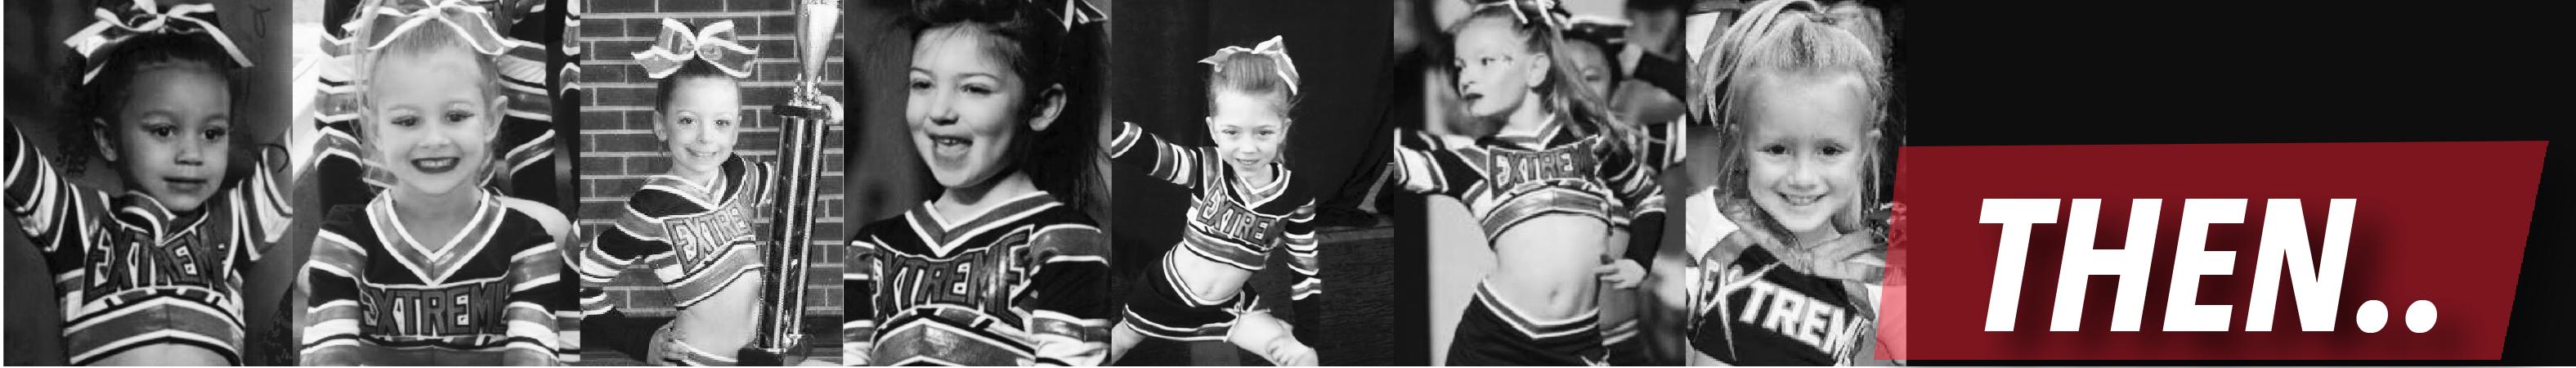 A New Generation Of Senior Elite Cheer Extreme